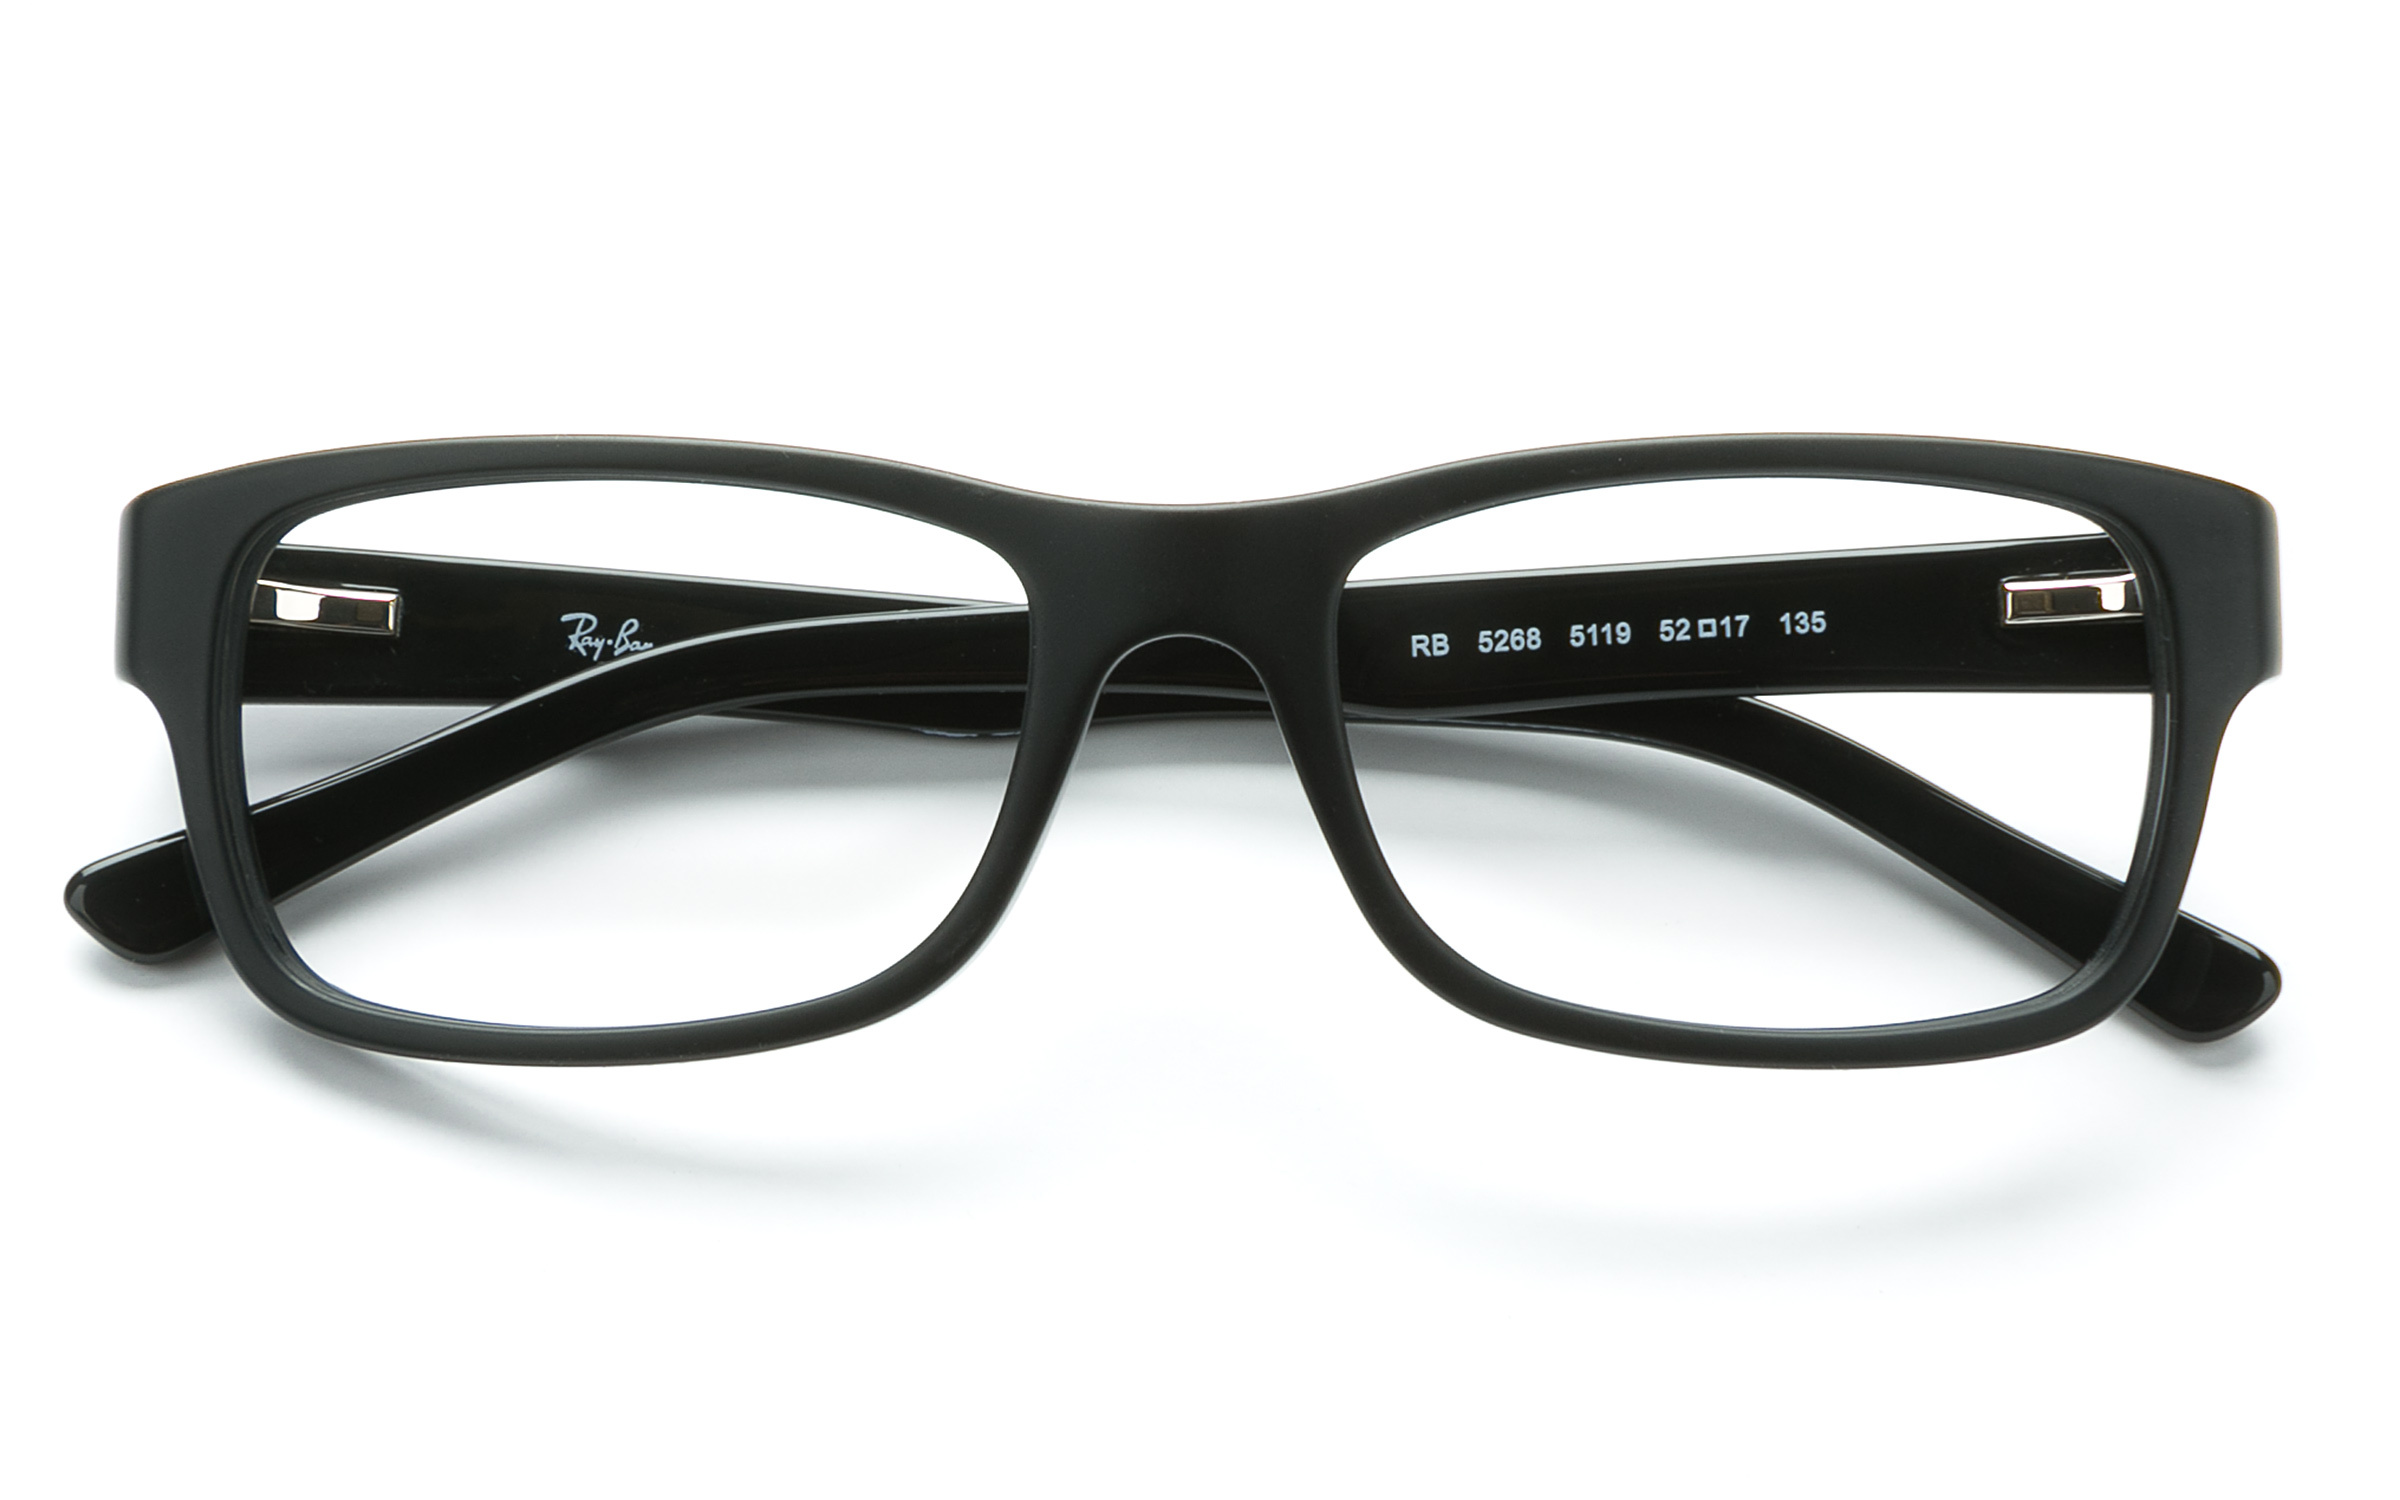 Очки от солнца мужские стекло купить в